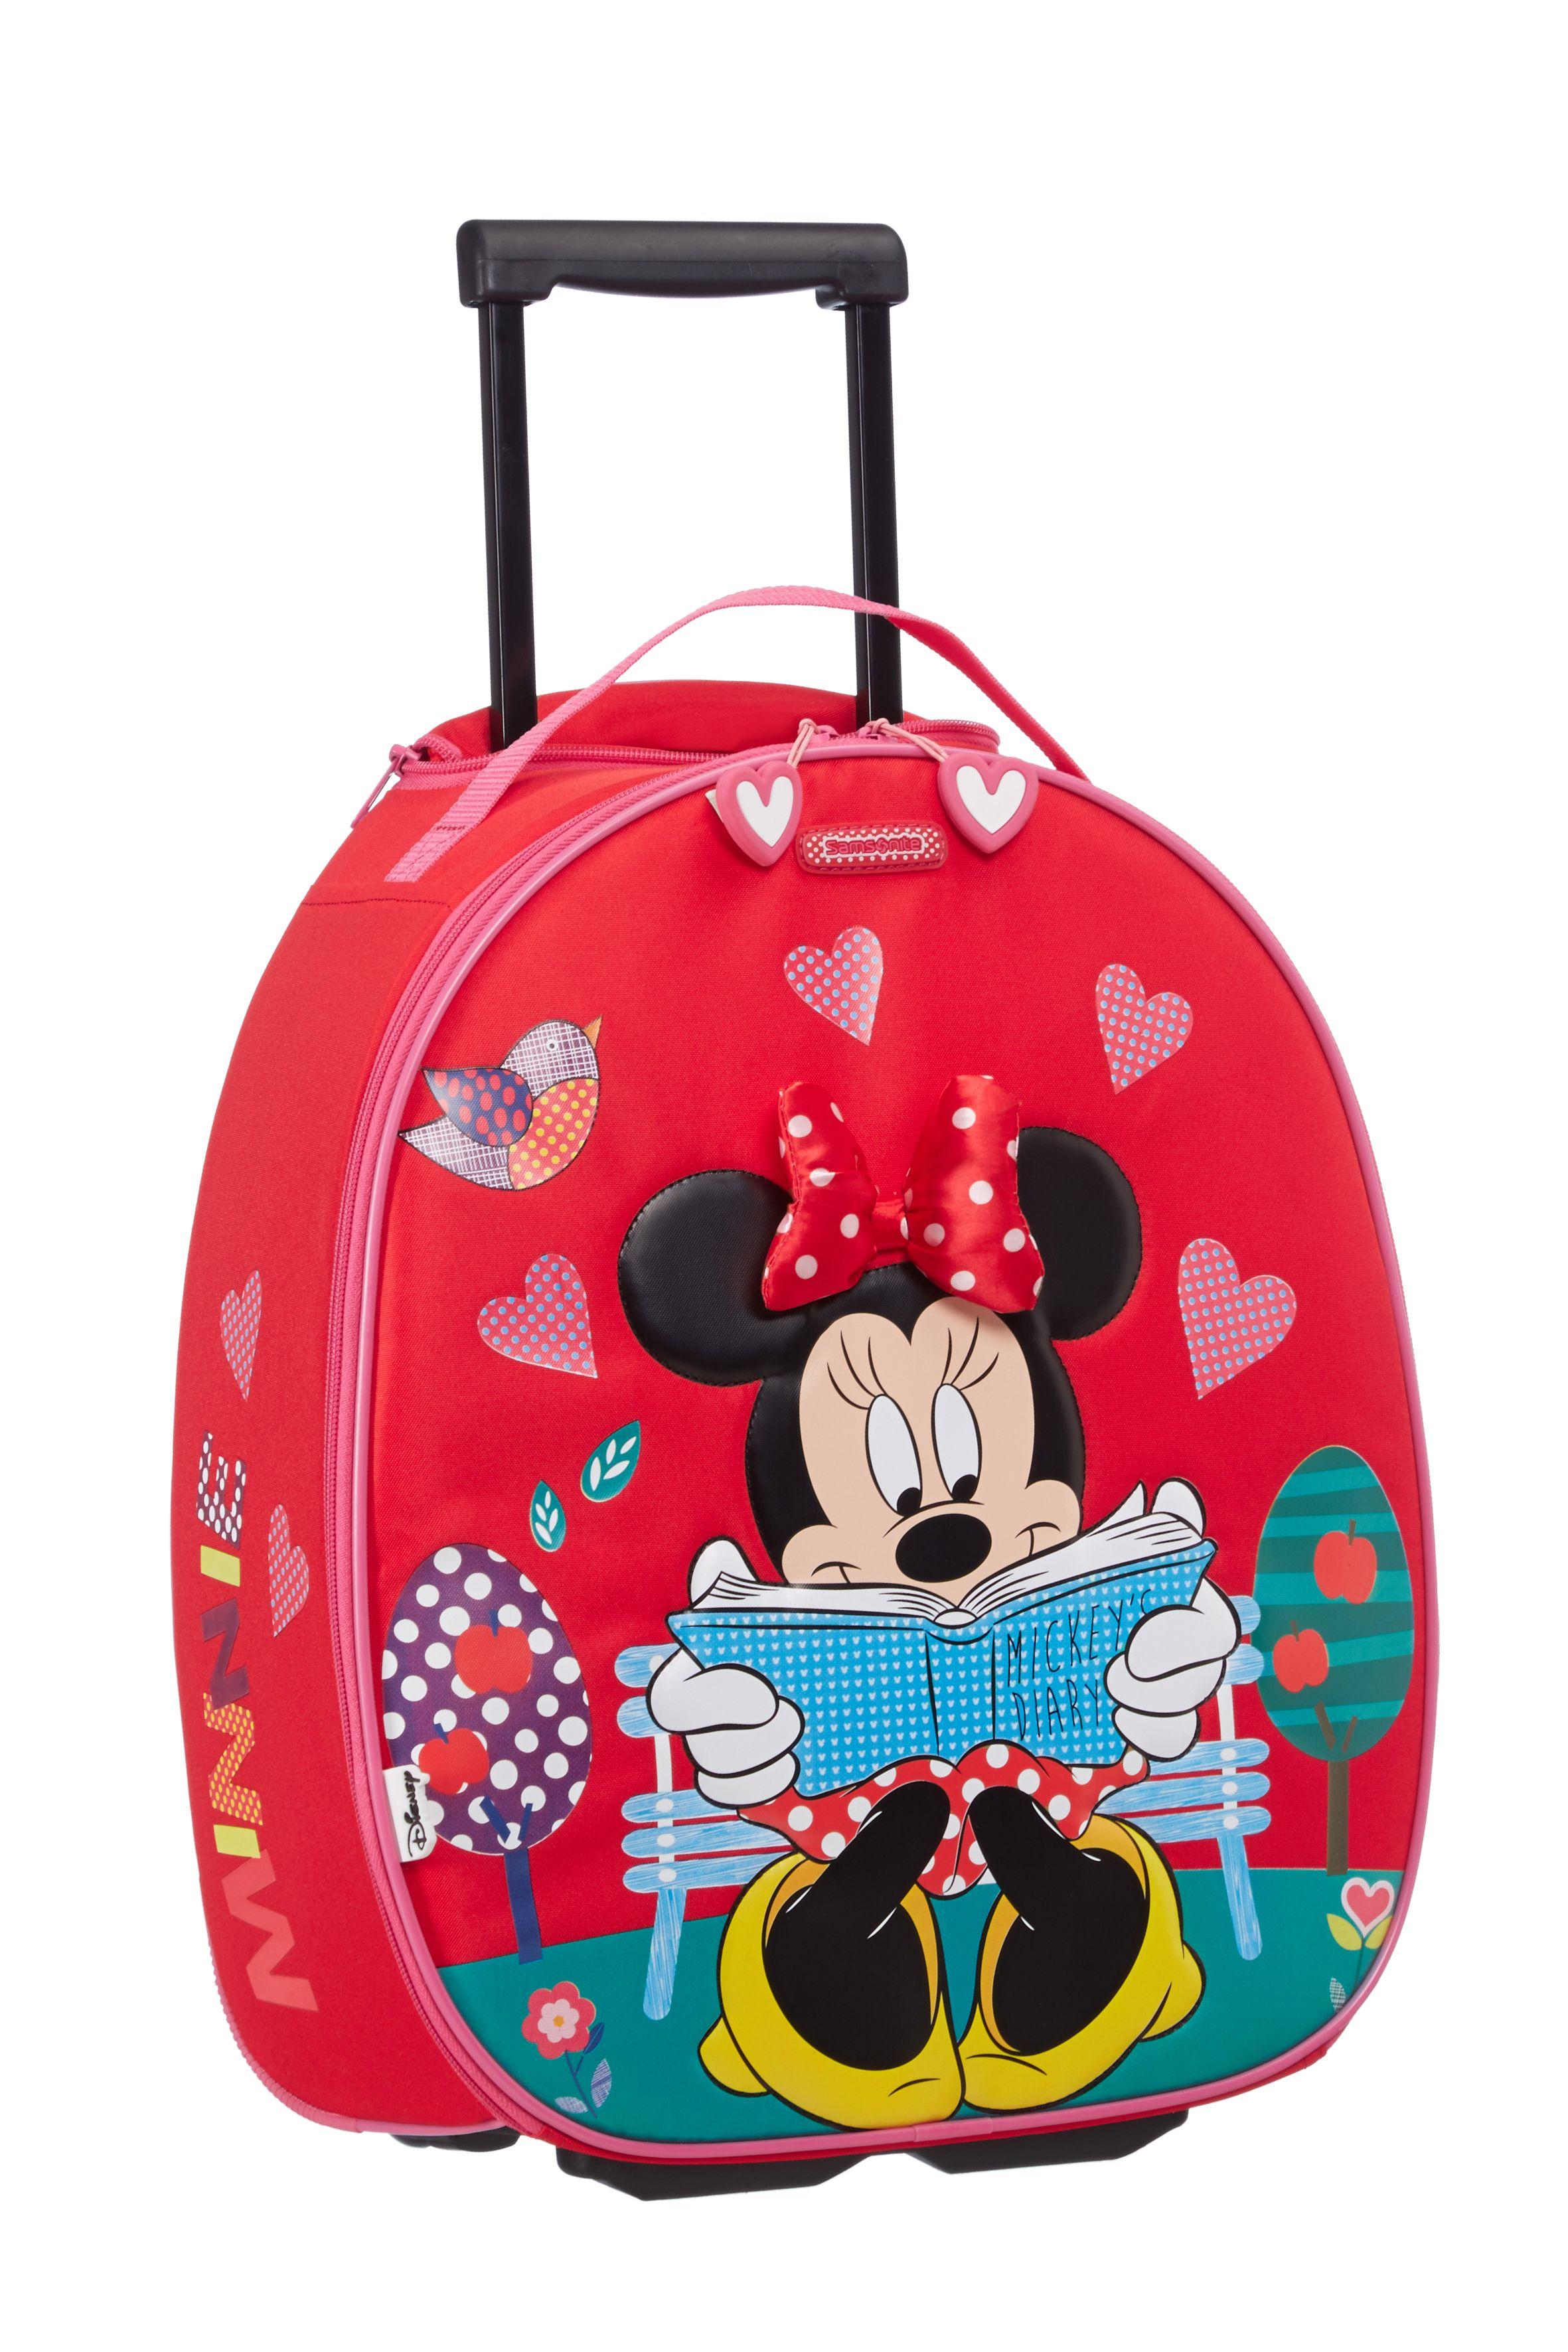 ec1e275d04 Disney Wonder - Minnie Mouse Soft Upright #Disney #Samsonite #MinnieMouse # Minnie #Mouse #Travel #Kids #School #Schoolbag #MySamsonite #ByYourSide